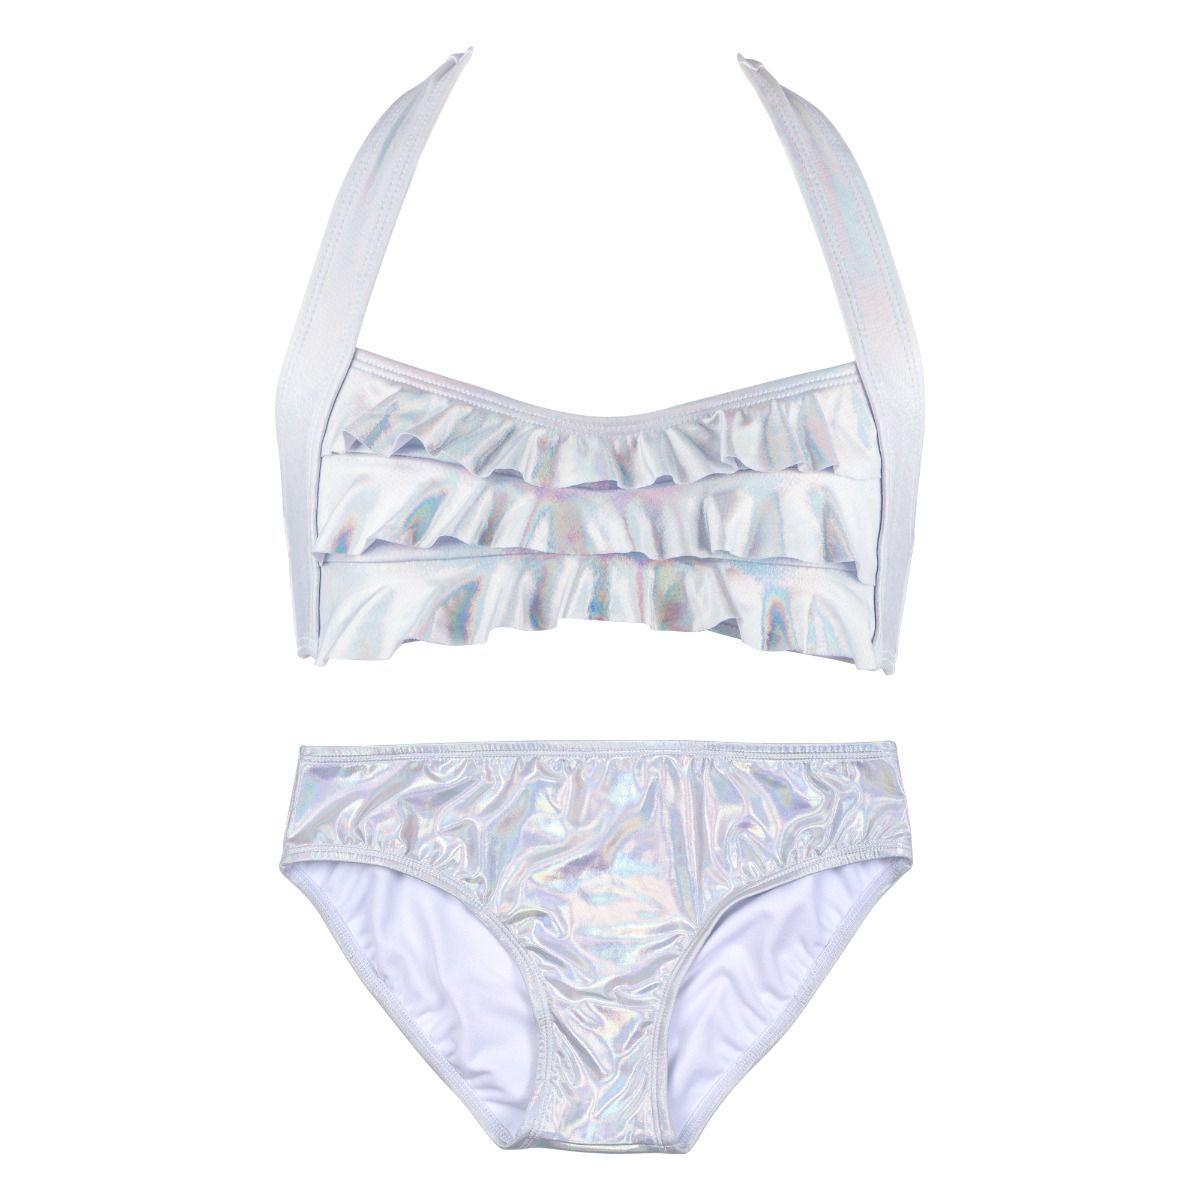 aa2063adee782 Iridescent Silver Sea Wave Bikini Set. Tap to expand